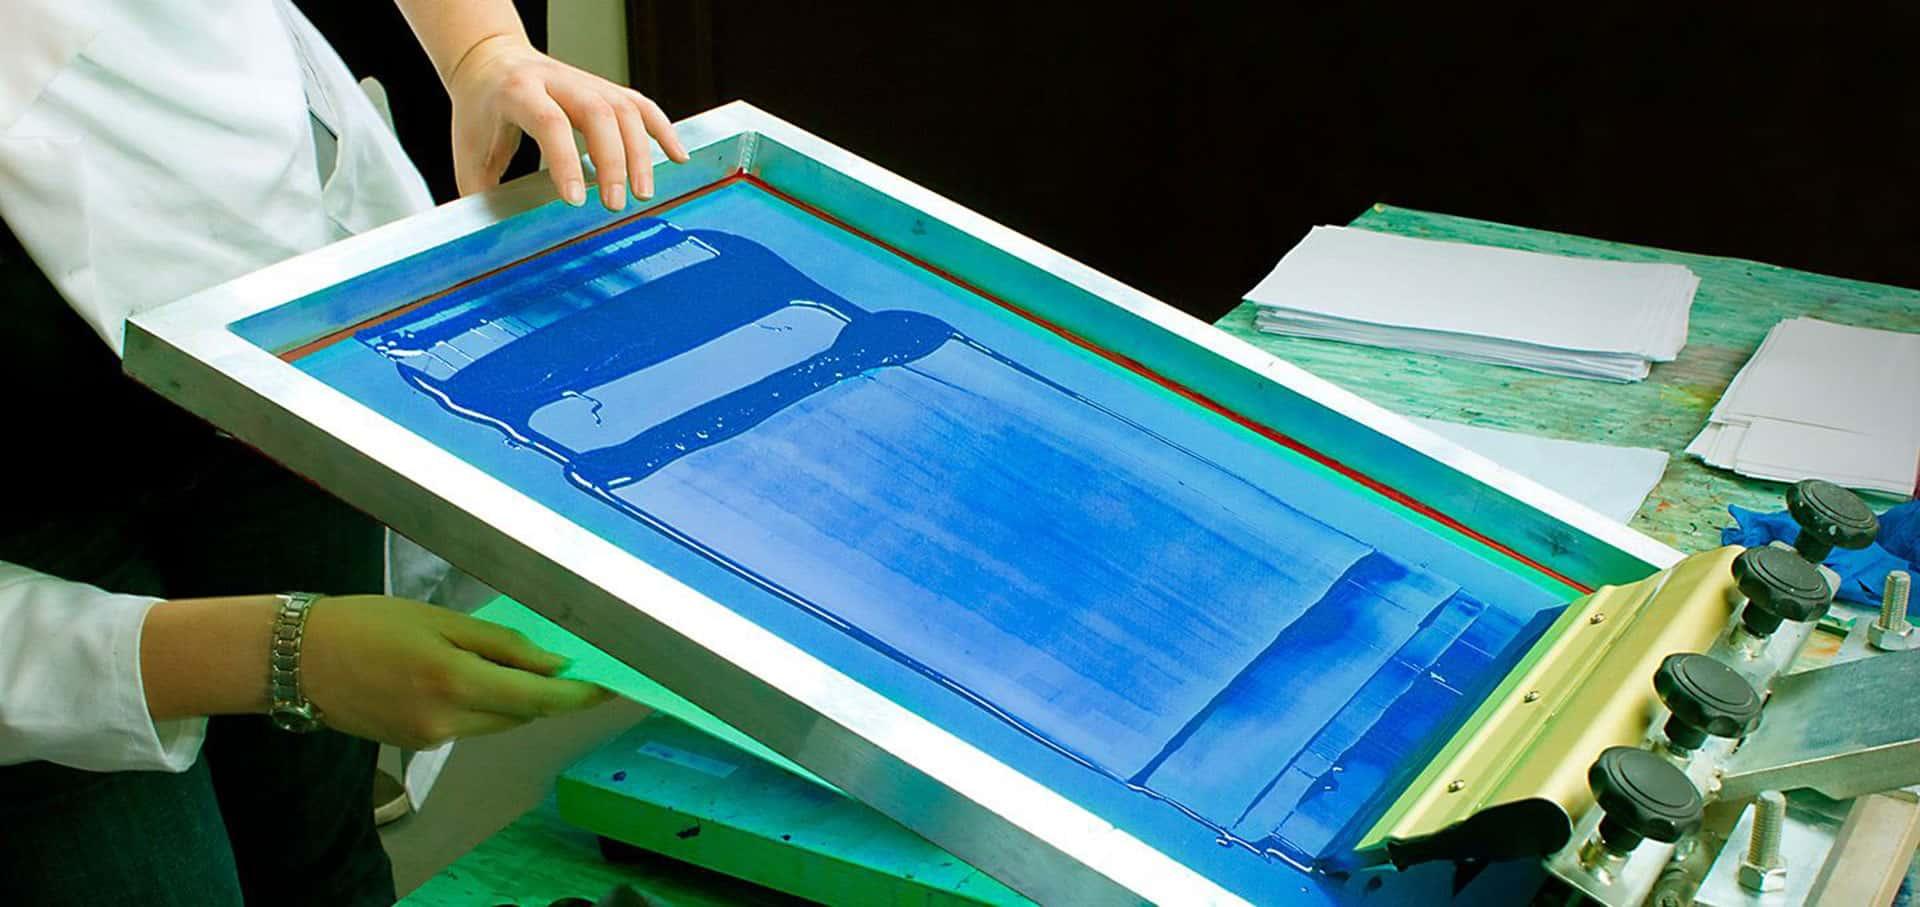 sito štampa forma šablon